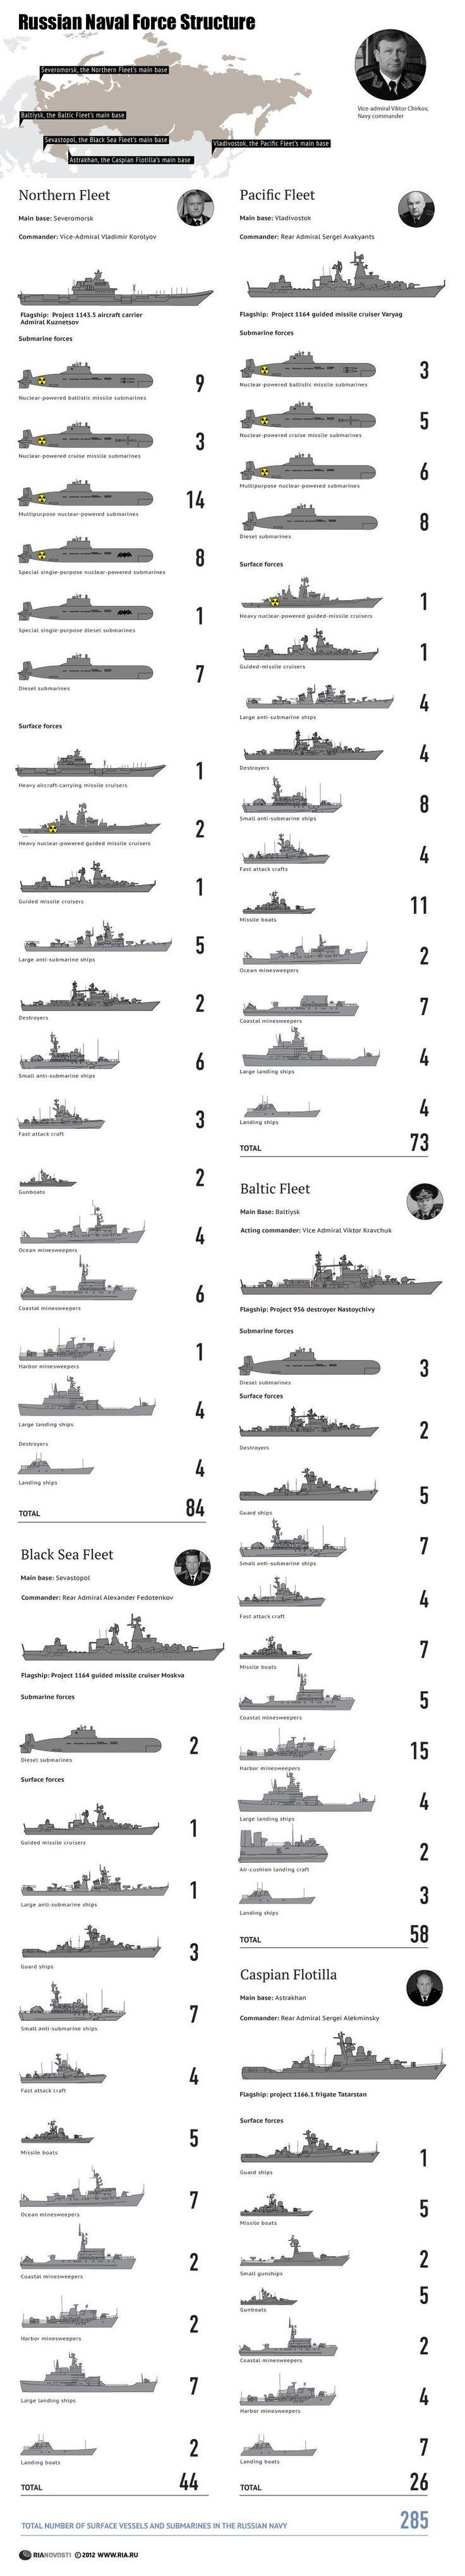 Fuerza Naval Rusa